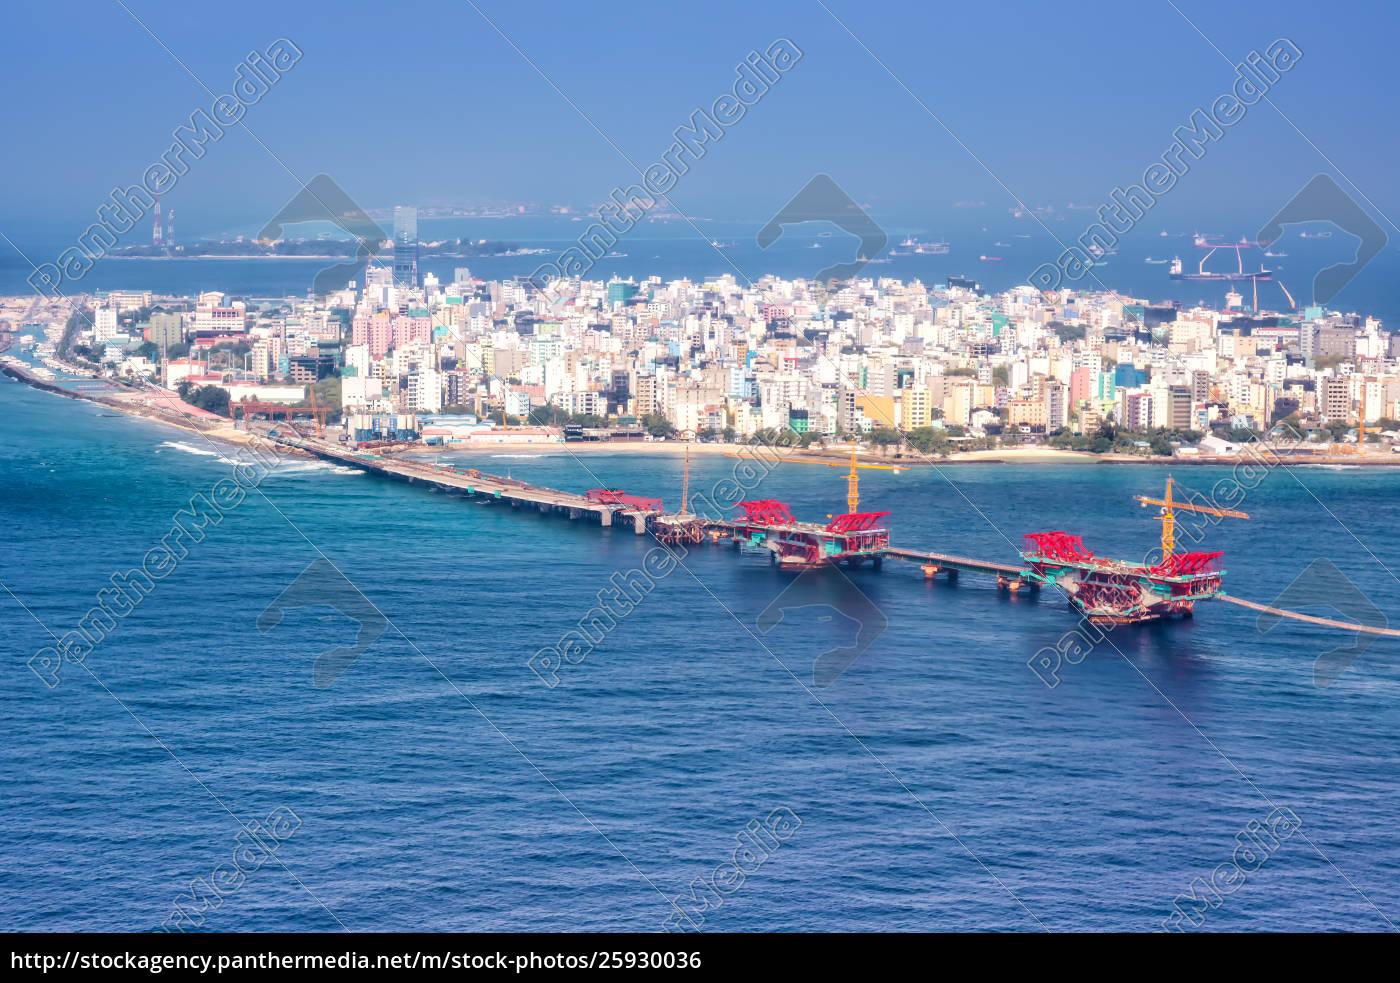 Royalty Free Photo 25930036 Male Maldives Capital City Island Sea Bridge Aerial Photo